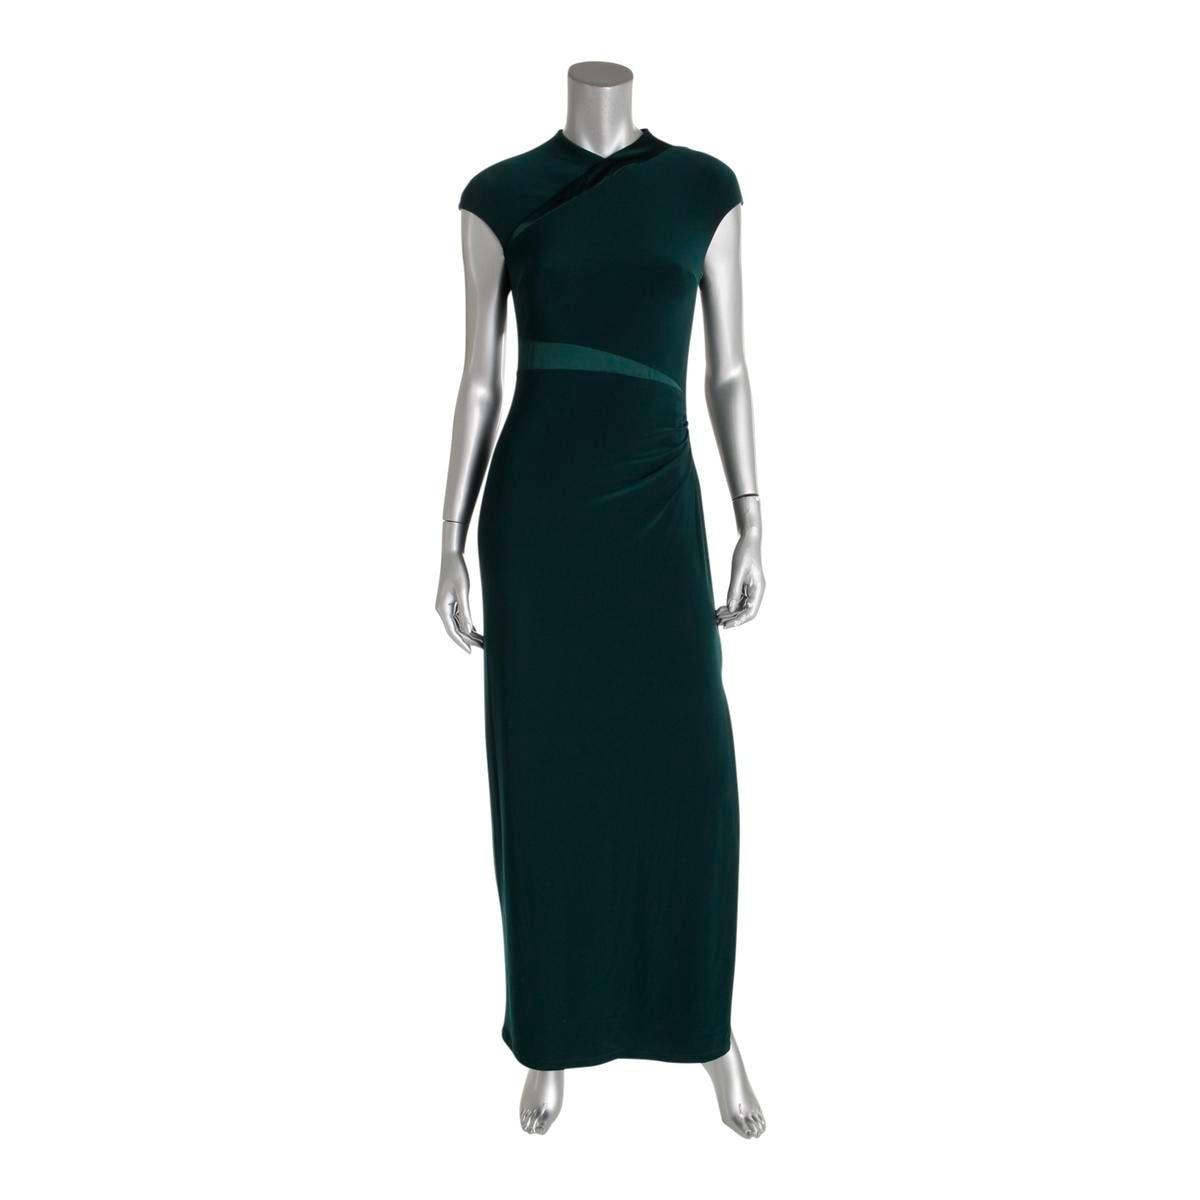 Lauren Ralph Womens Pees Lita Evening Dress Satin Trim Jersey Free Shipping On Orders Over 45 19218819